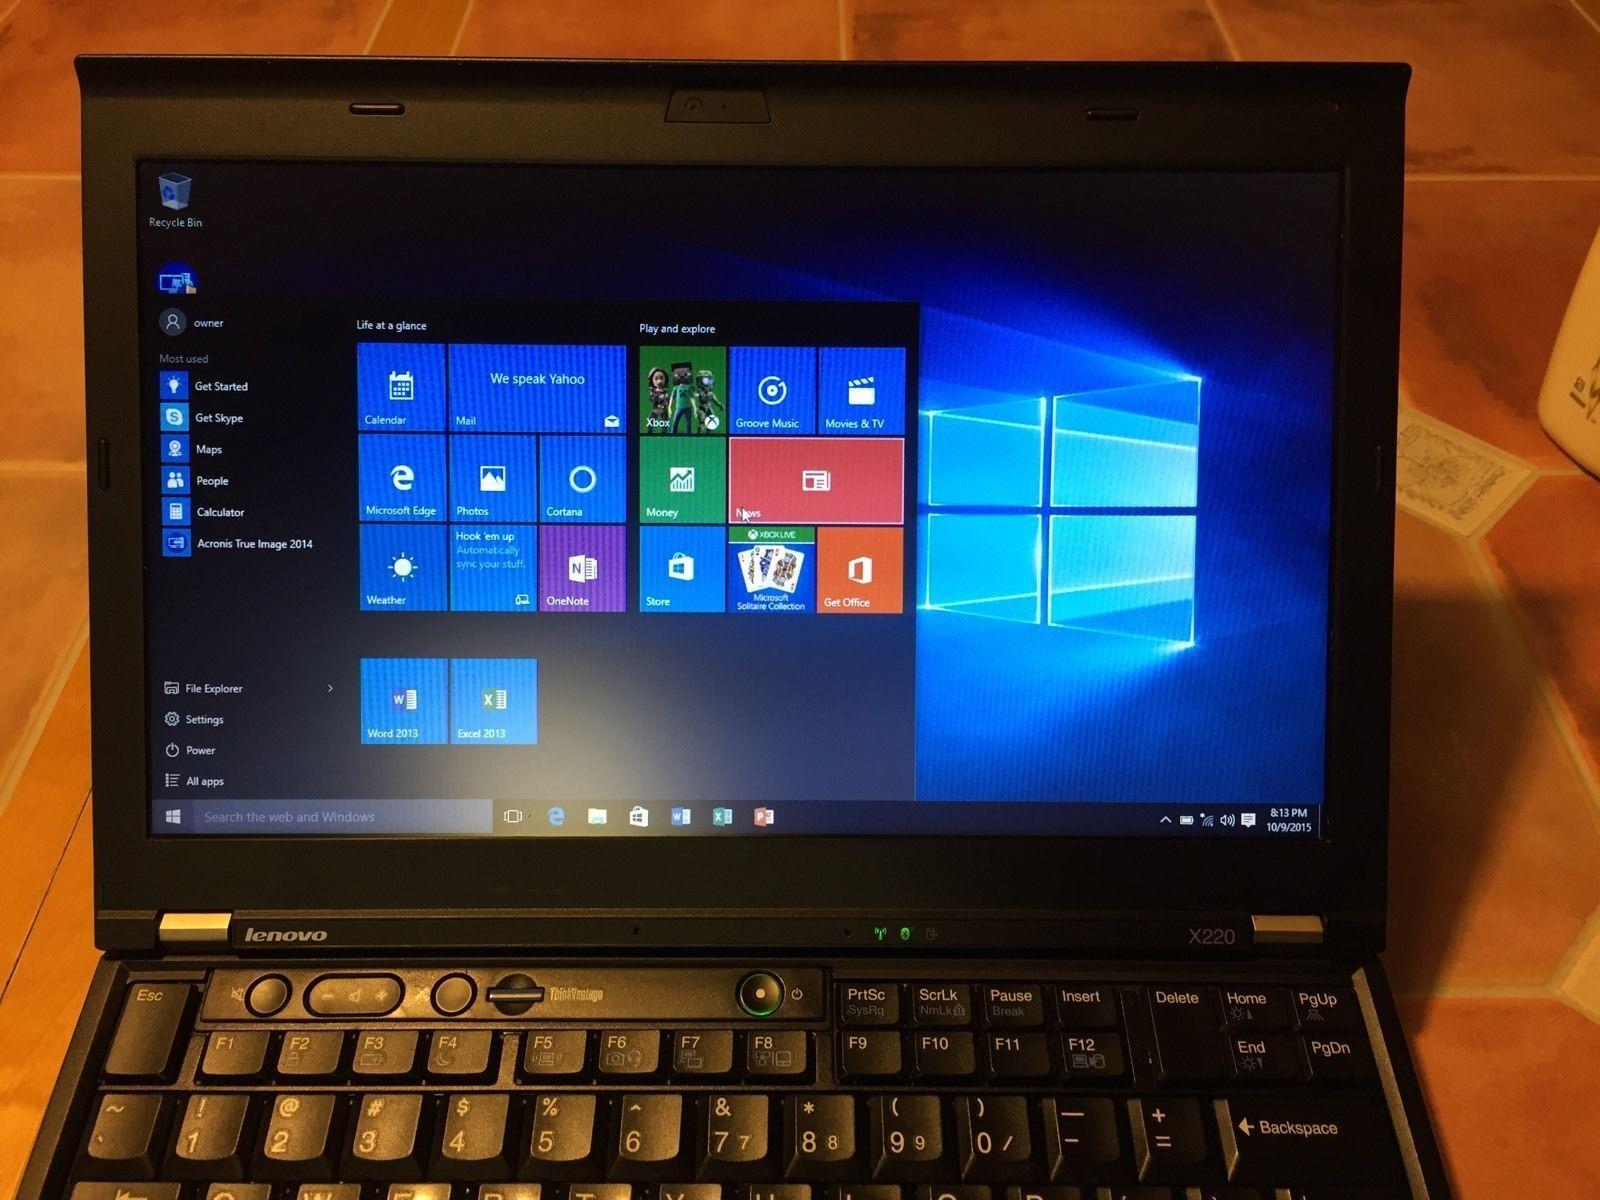 "Lenovo ThinkPad X220 12.5"" Laptop PC i5-2520M 128GB SSD 4GB RAM Windows 10 Pro"